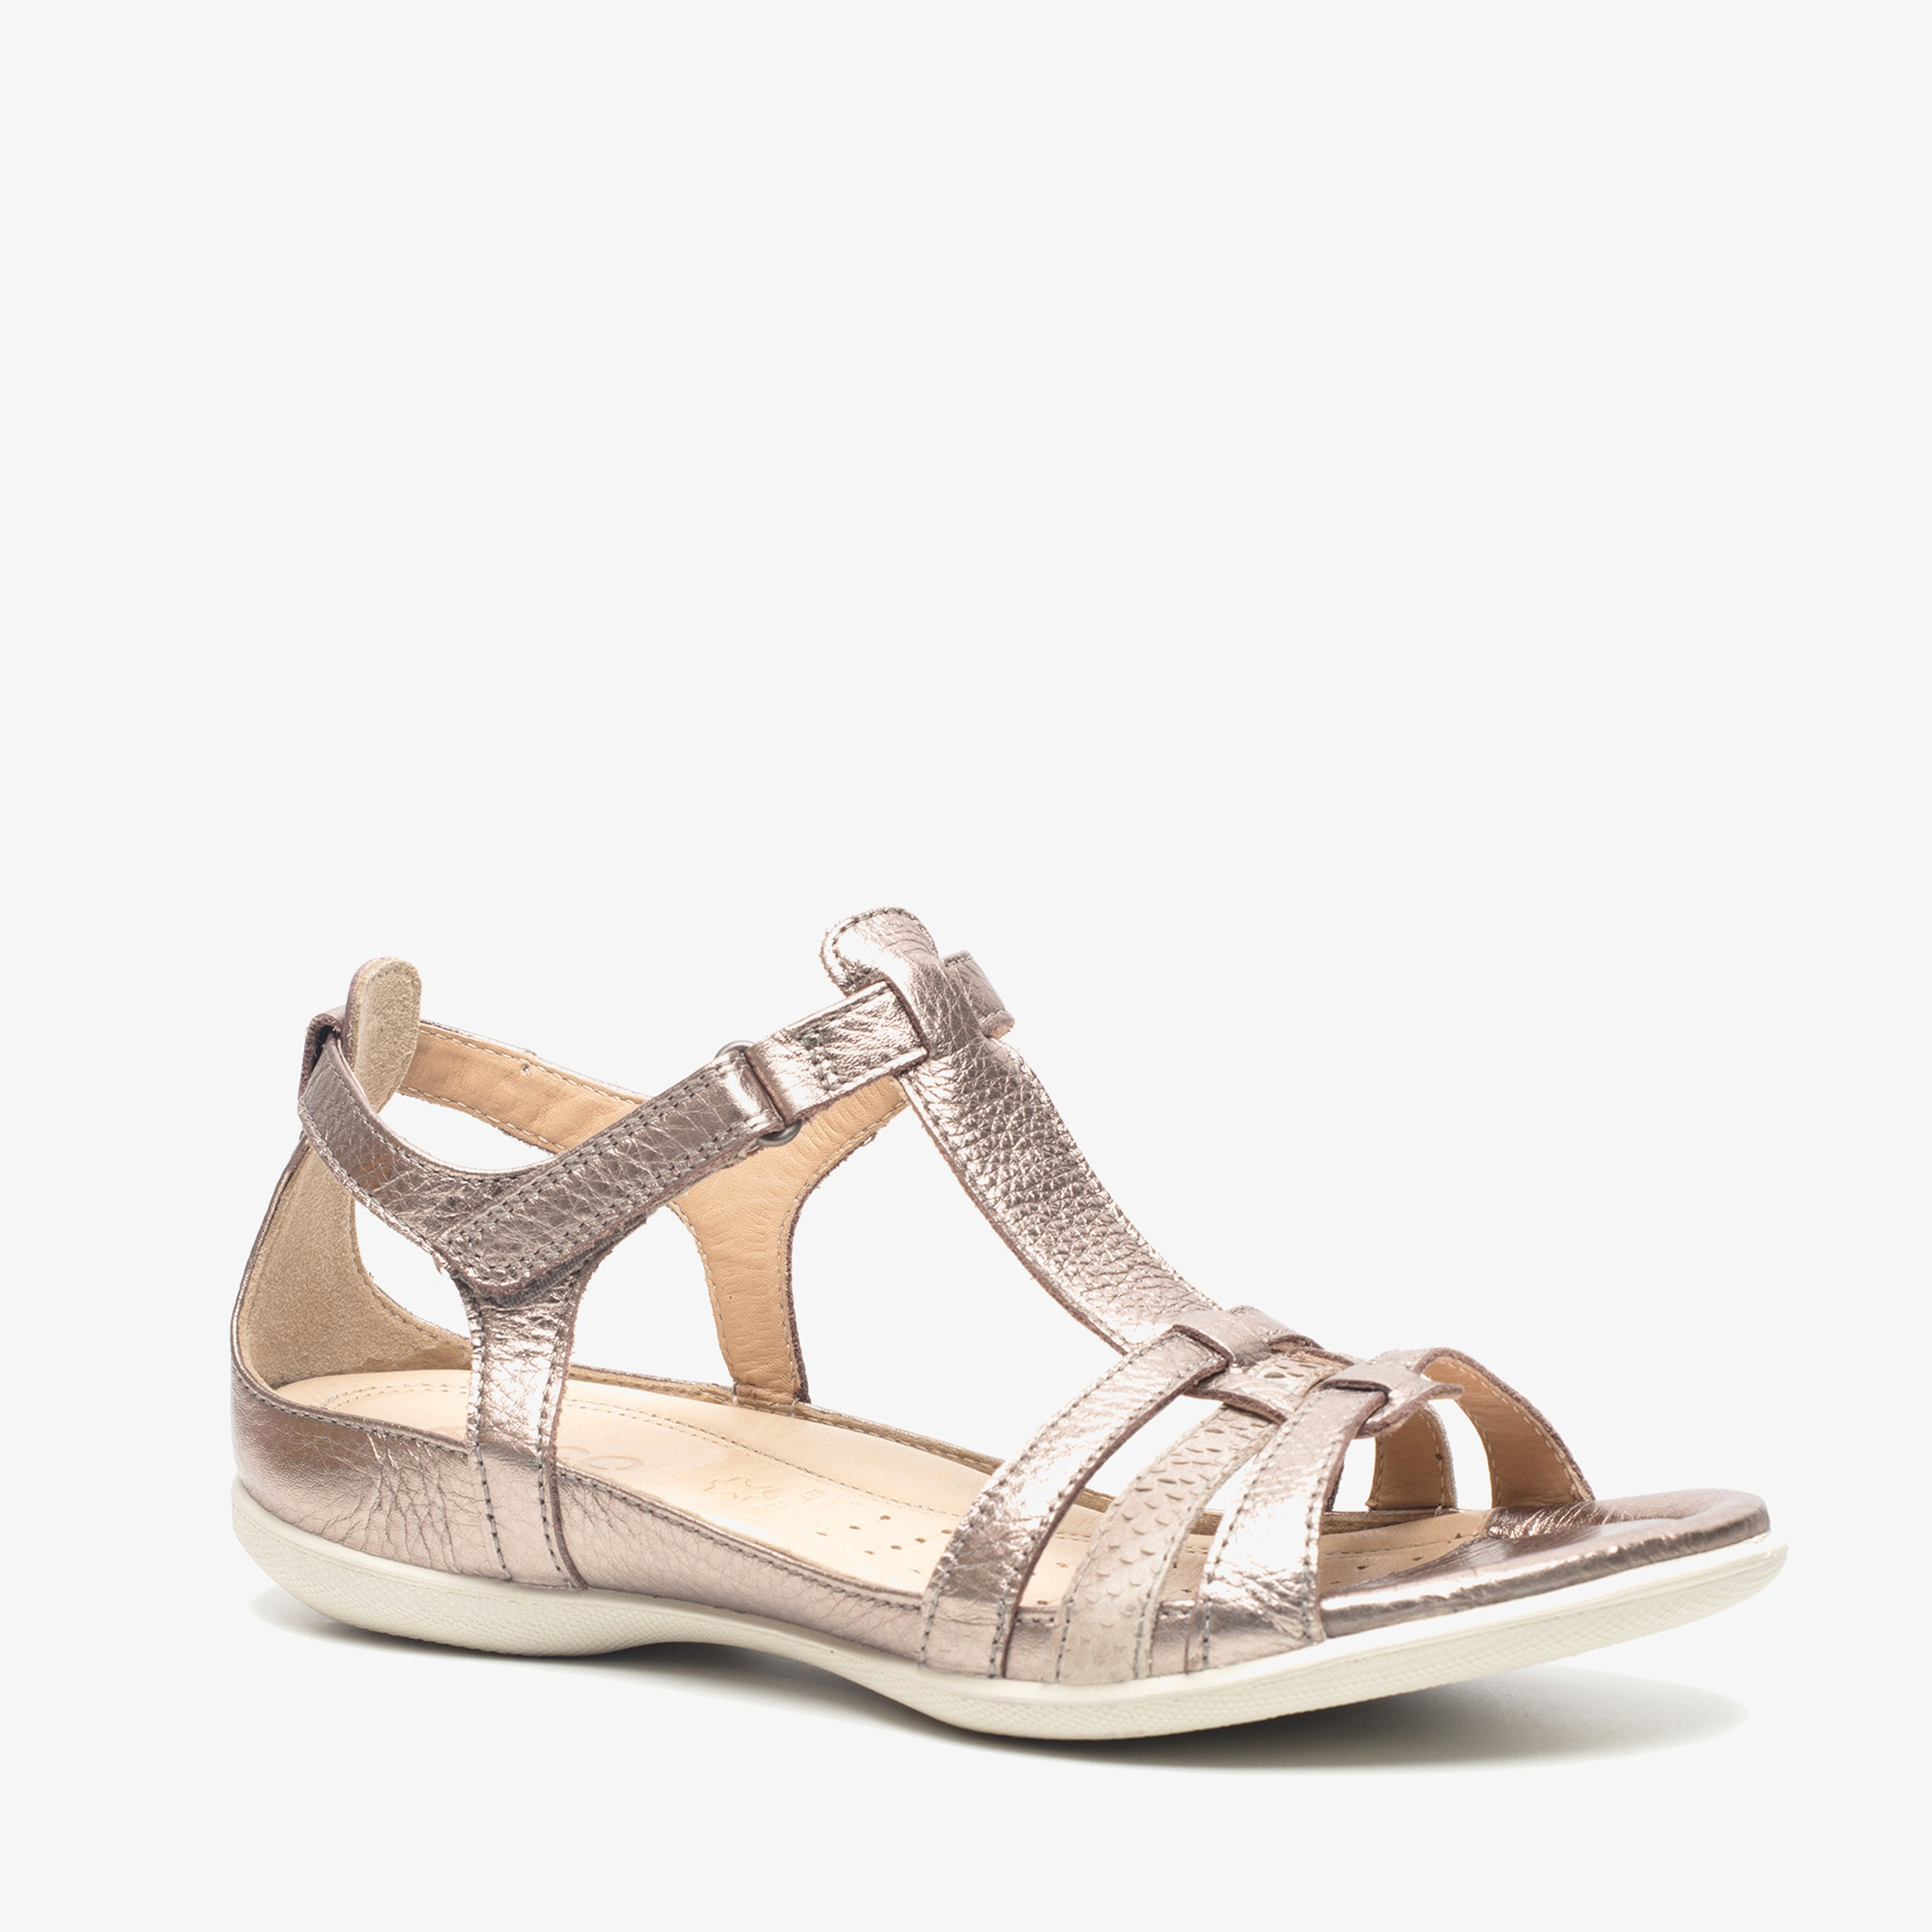 ECCO Flash leren dames sandalen | Scapino.nl